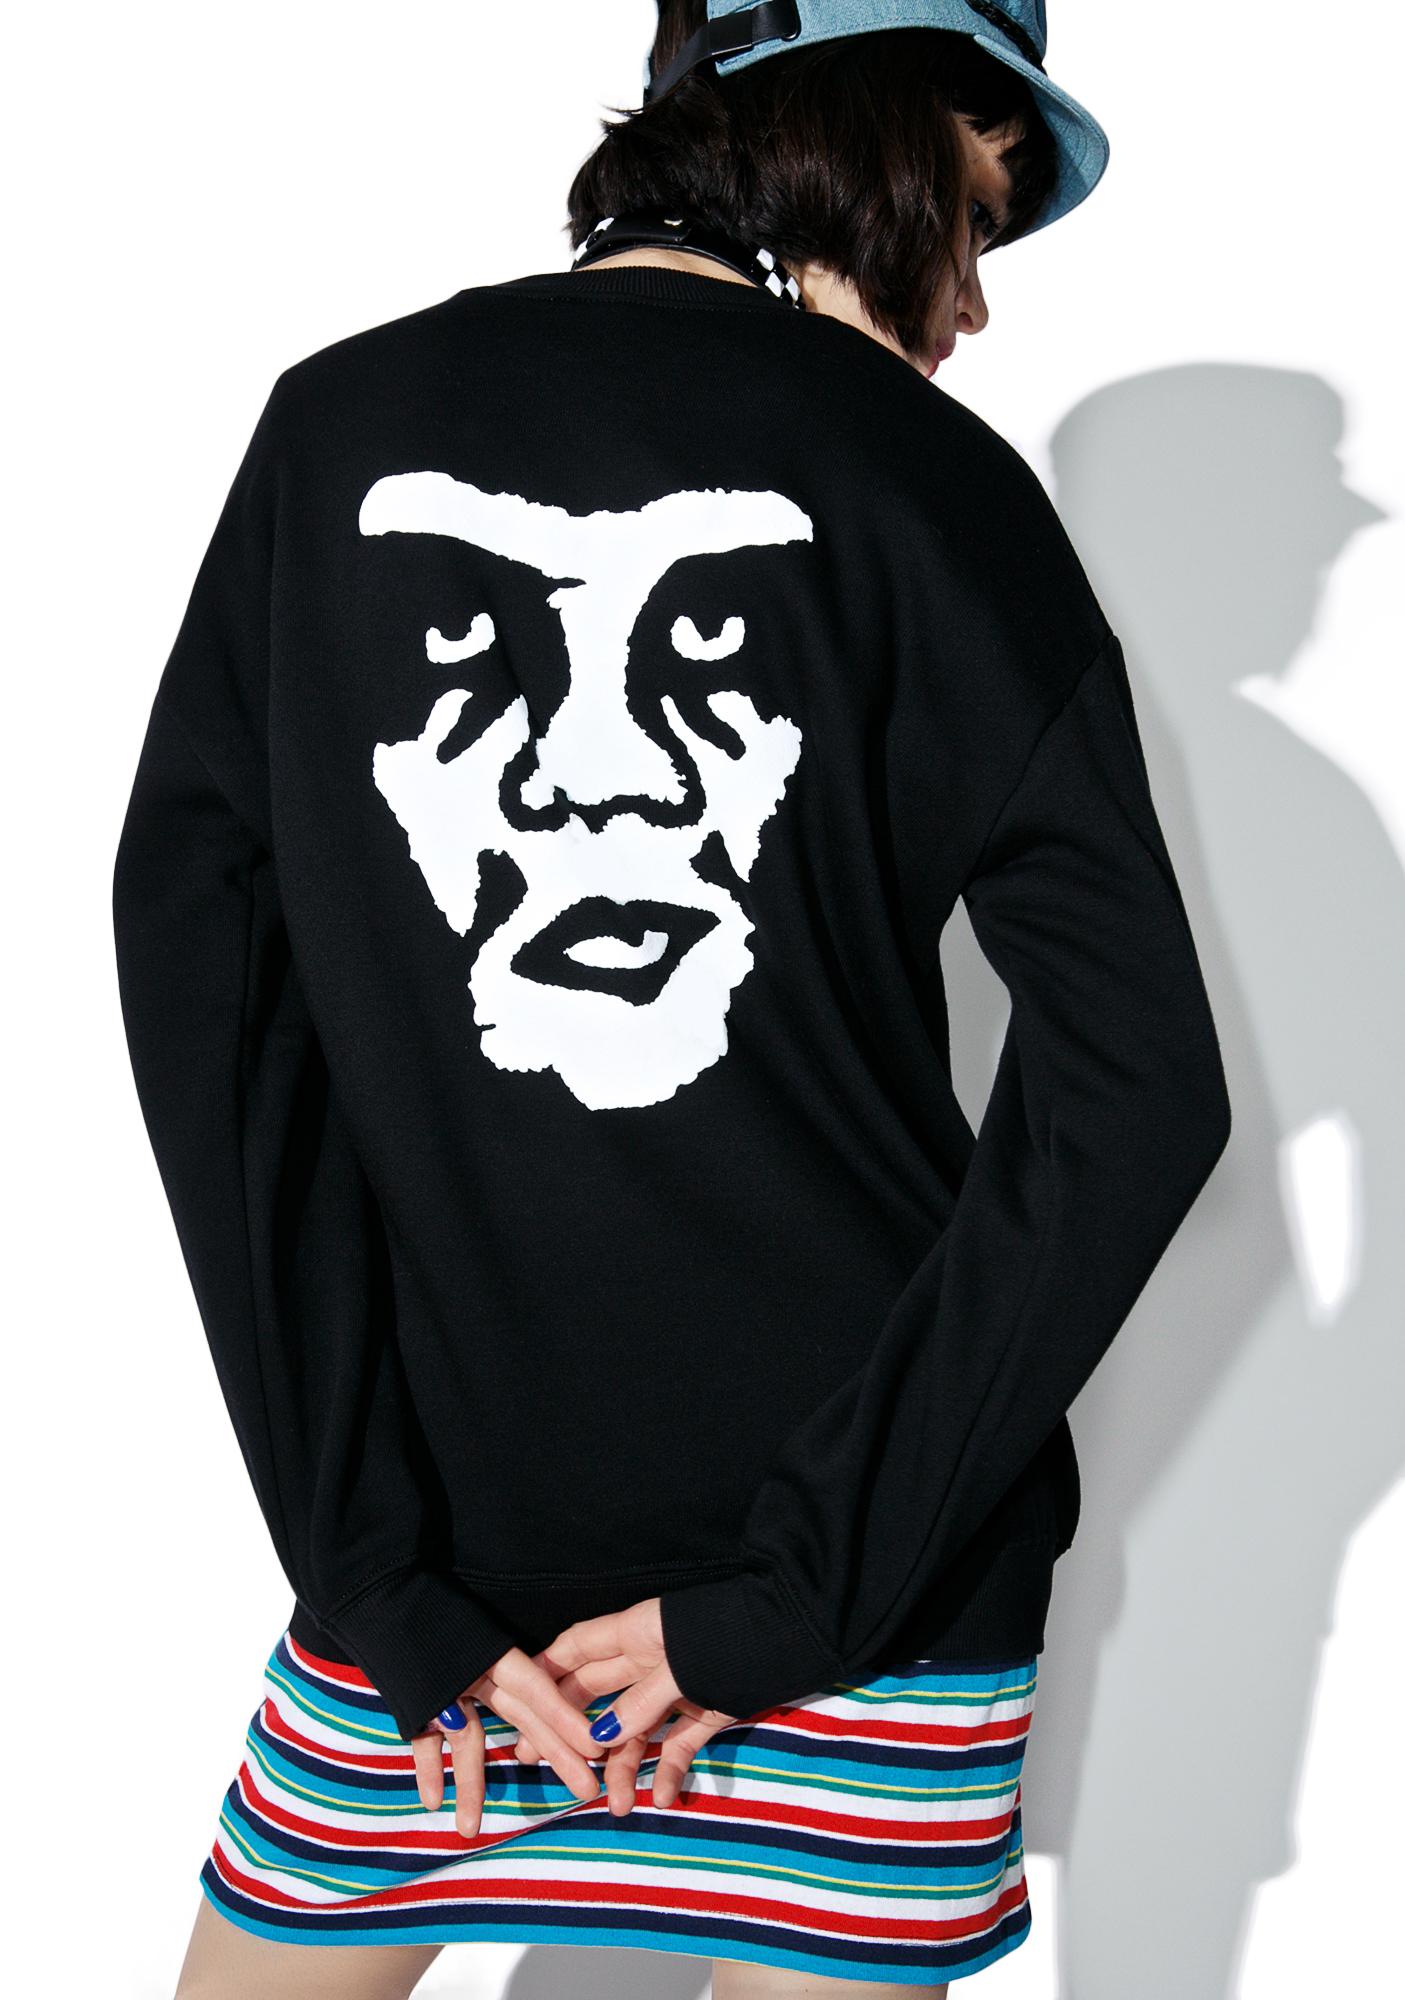 Obey The Creeper Crewneck Sweatshirt